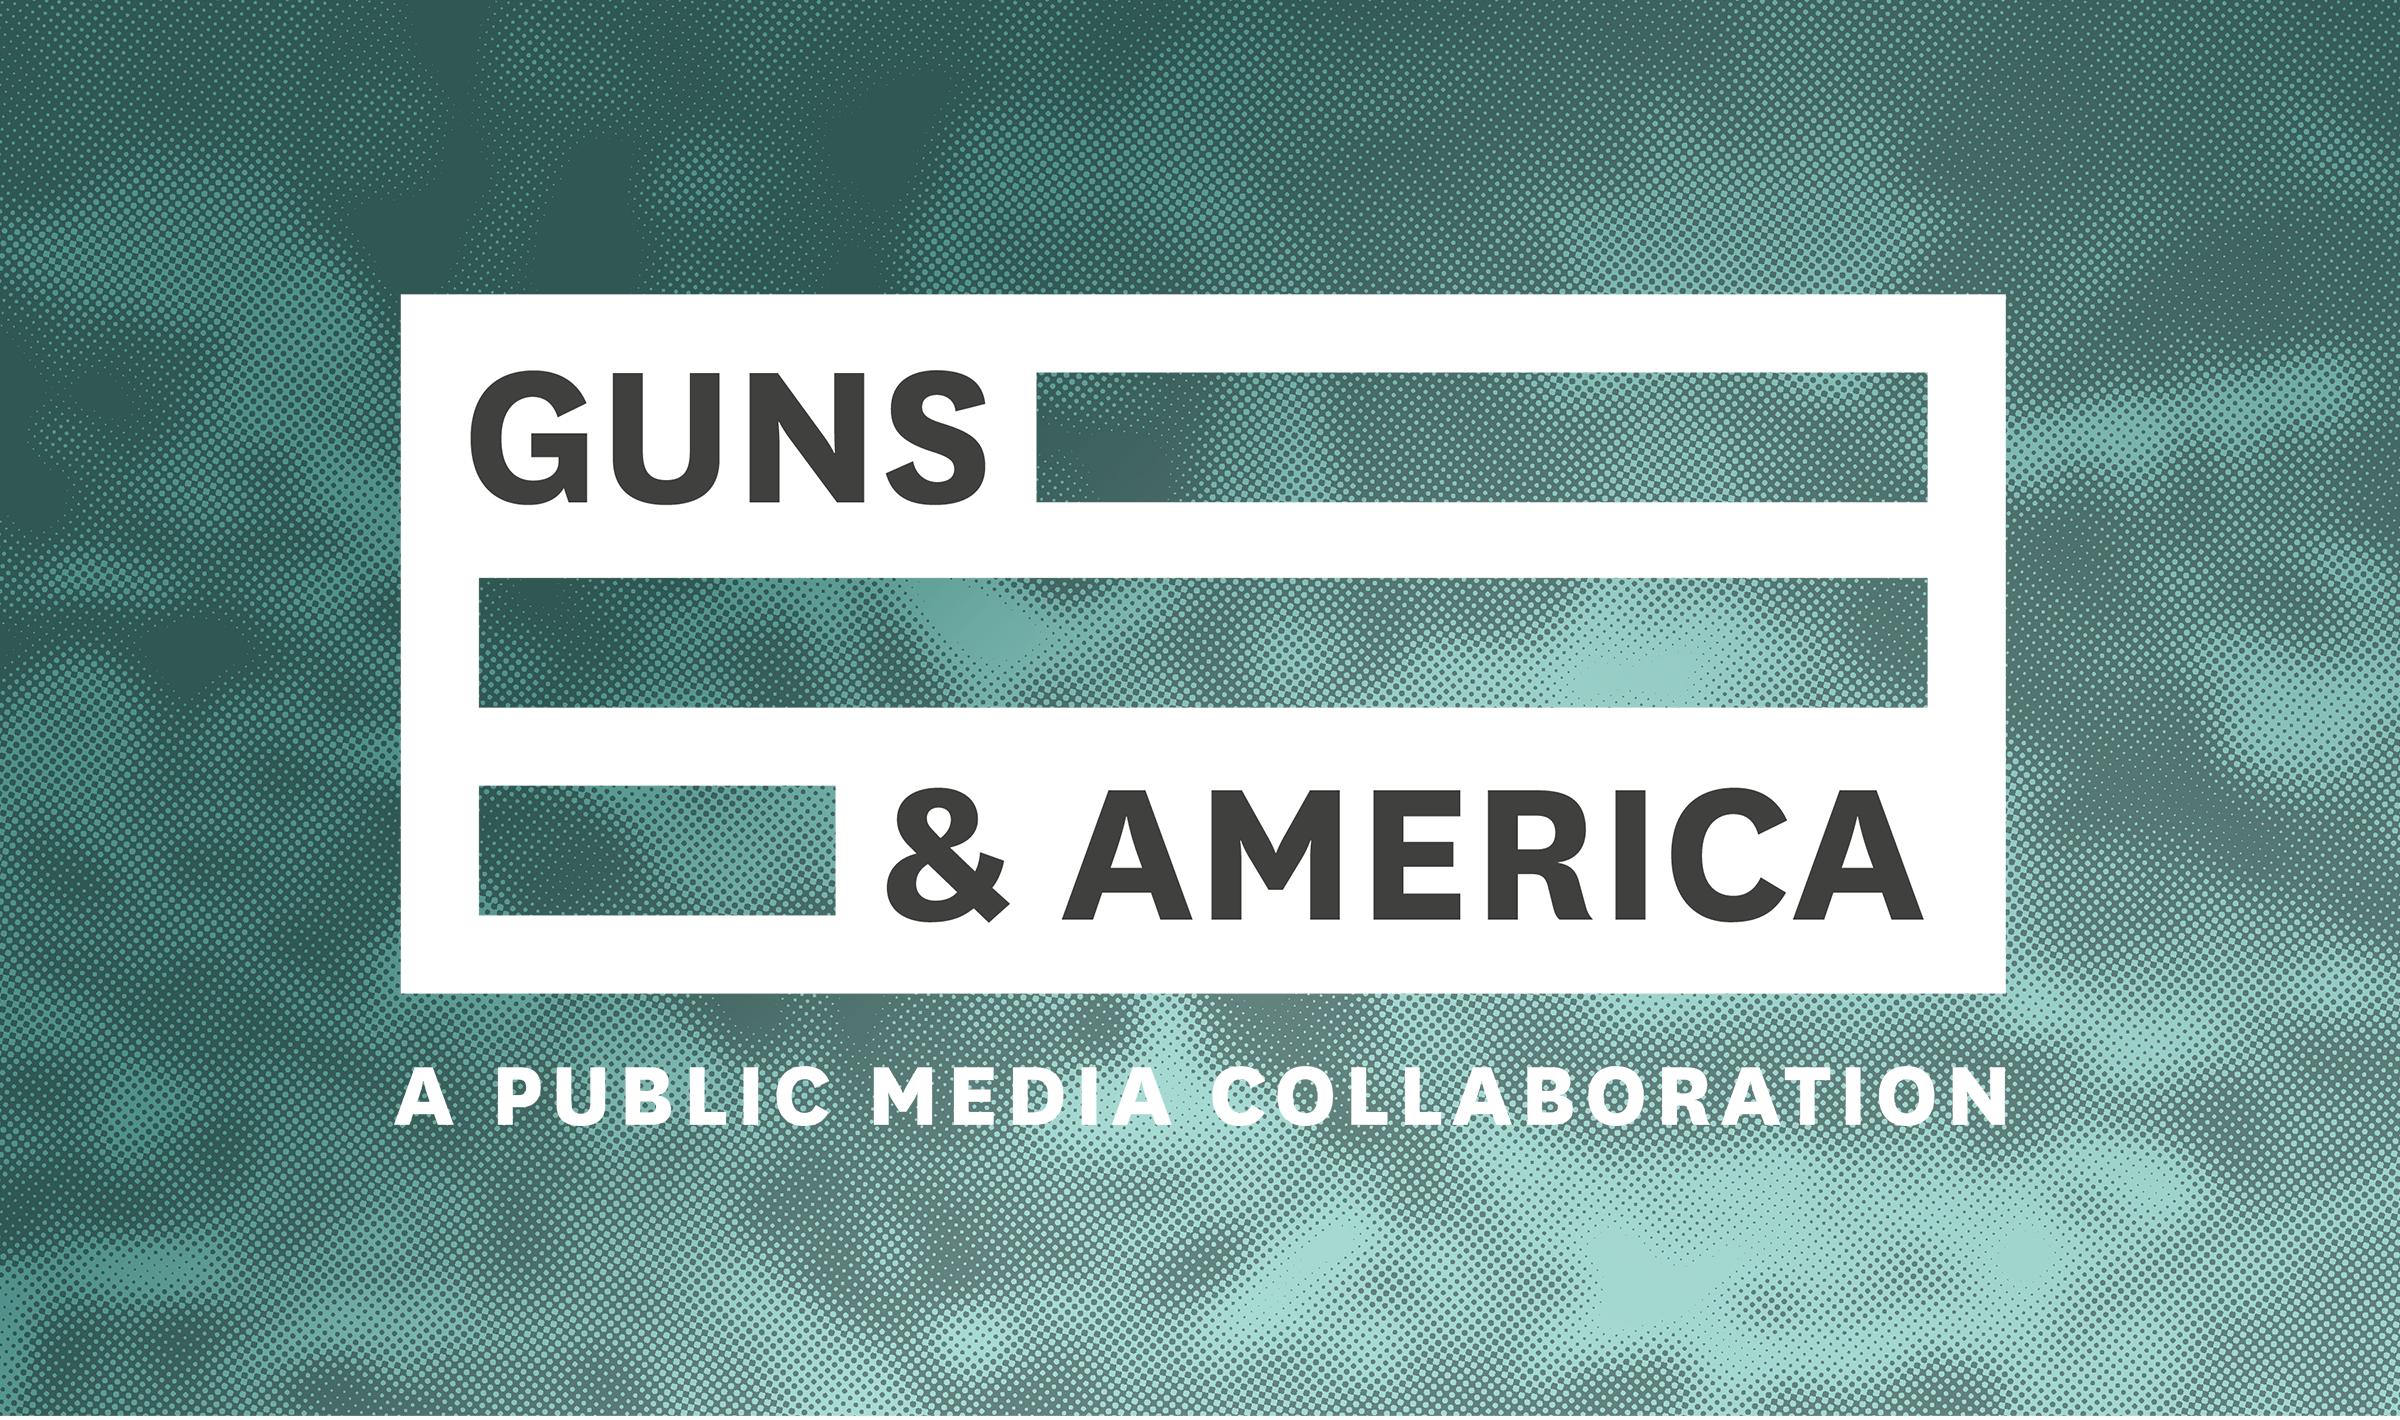 Guns & America